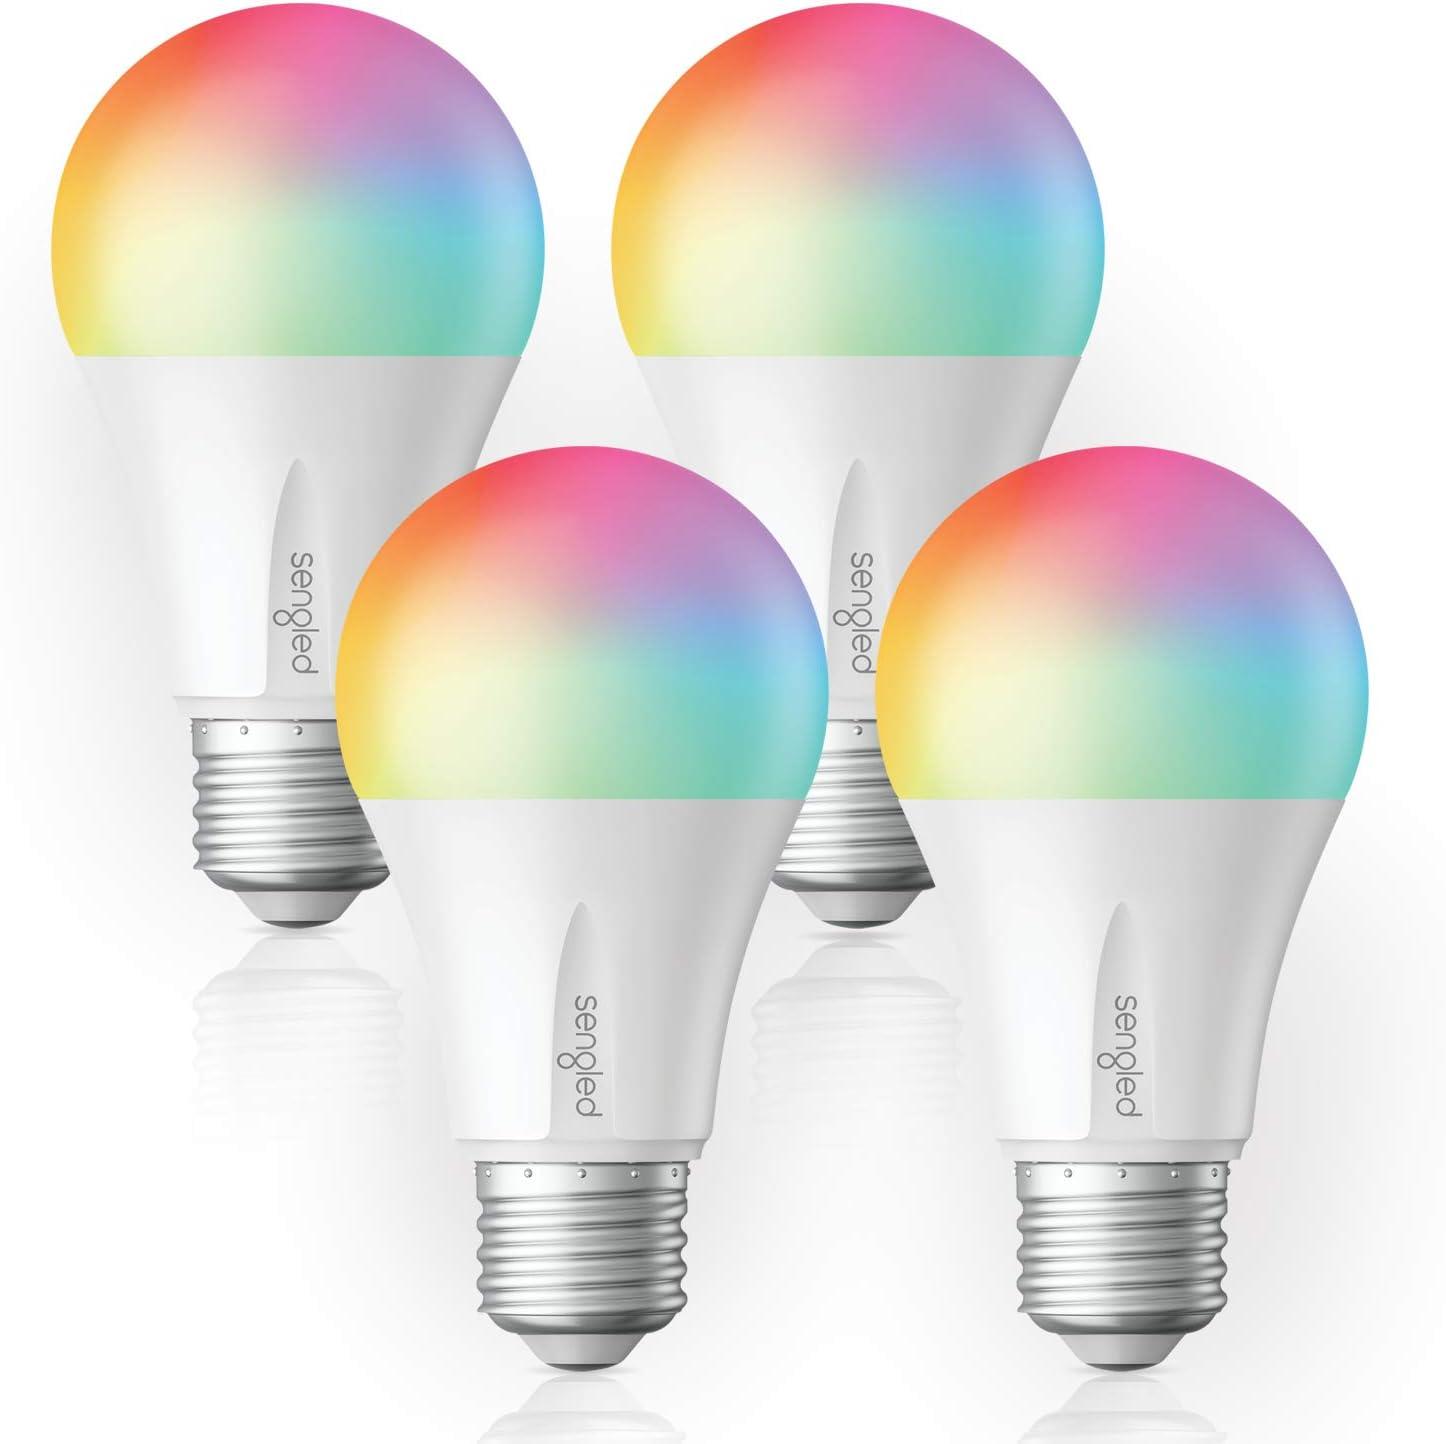 Smart Home Sengled 60W 4 Pack A19 LED Light Bulb Alexa Smart Things Sylvania